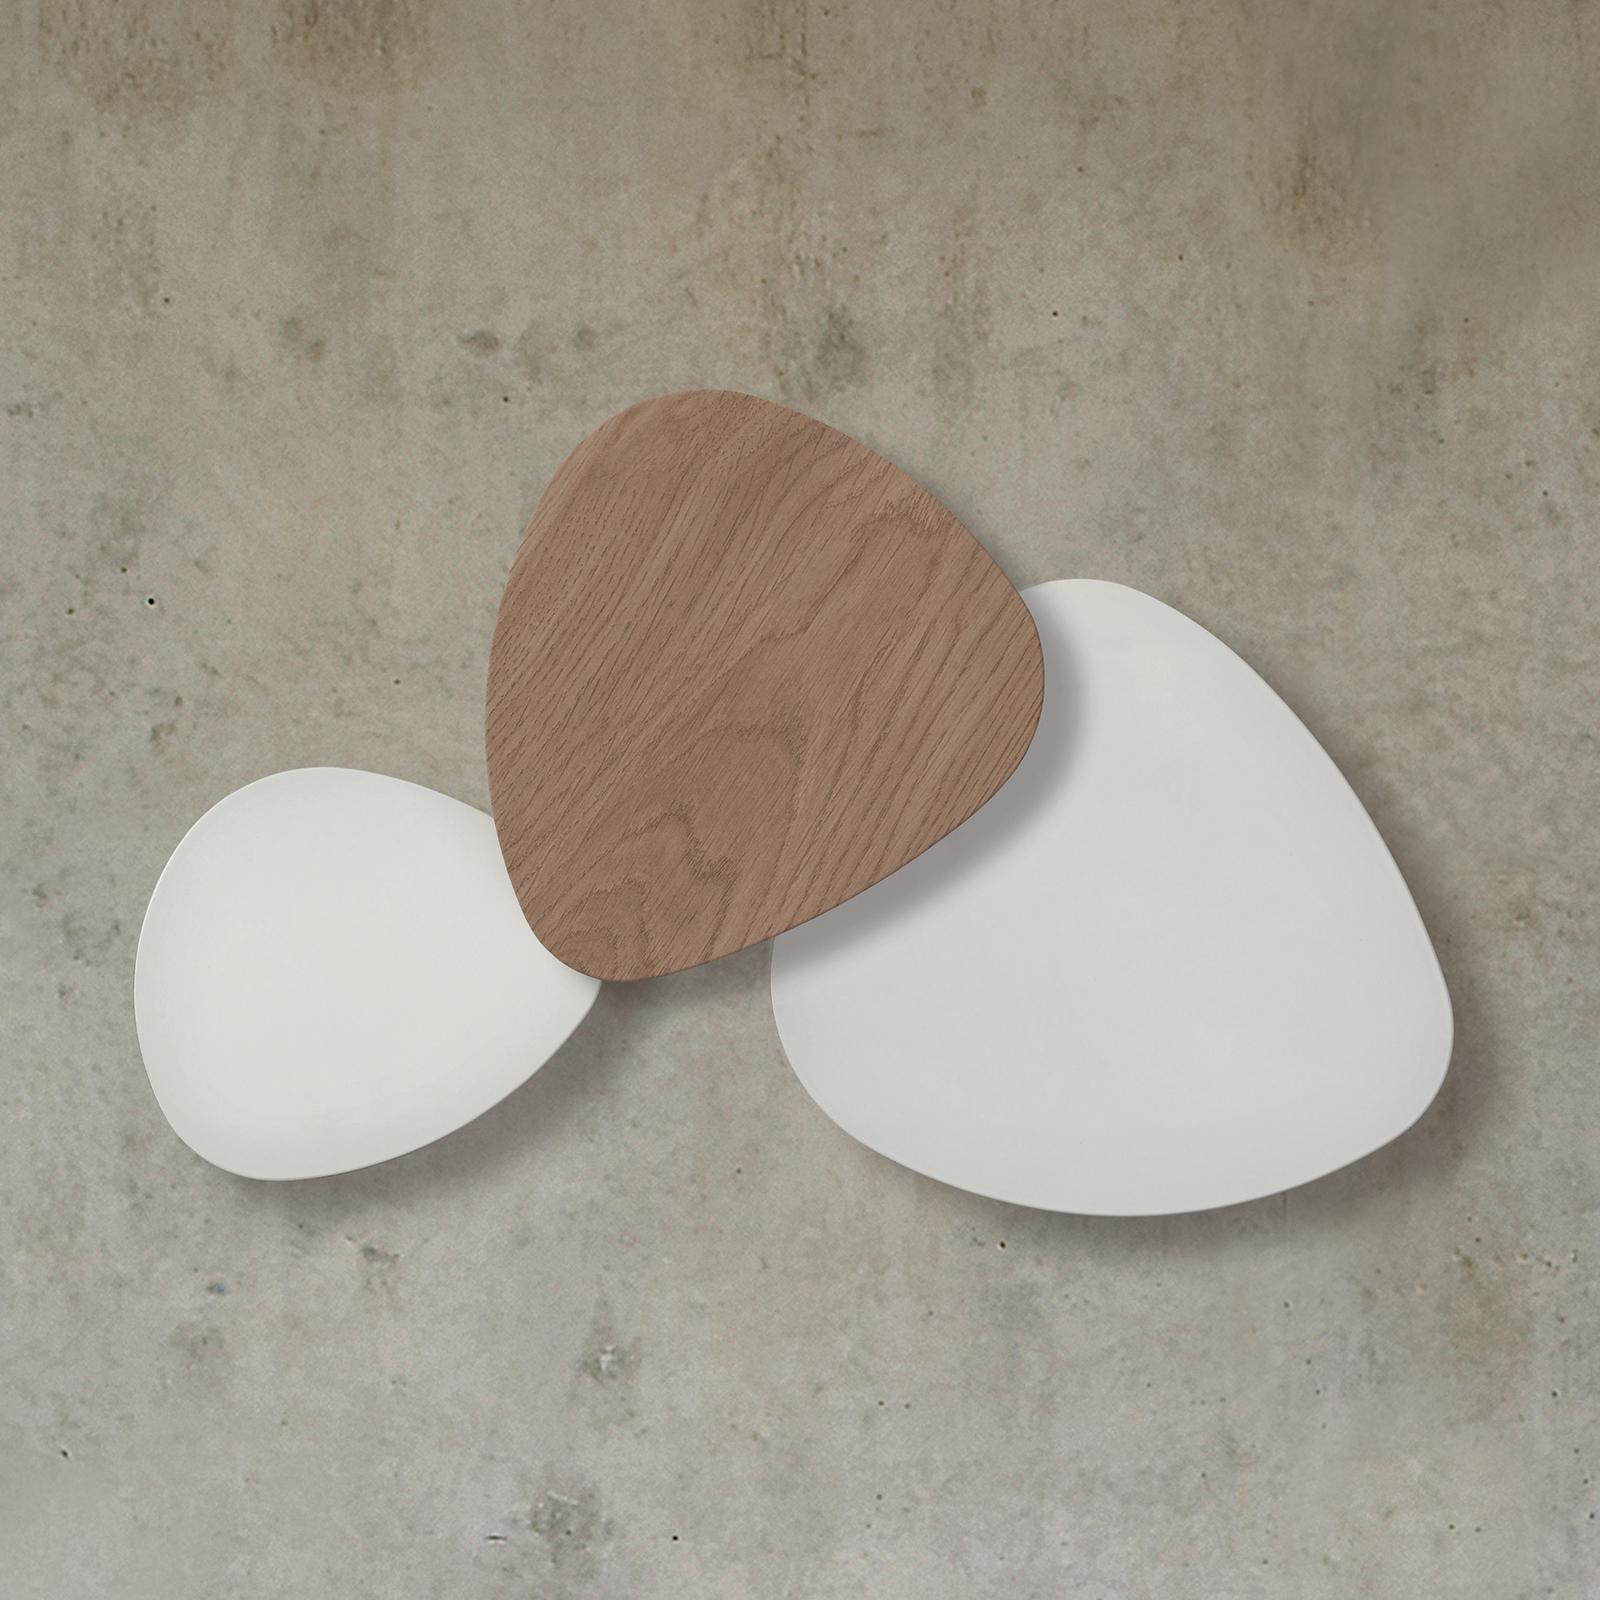 Bover Tria Set 3 applique LED, blanc-chêne-blanc